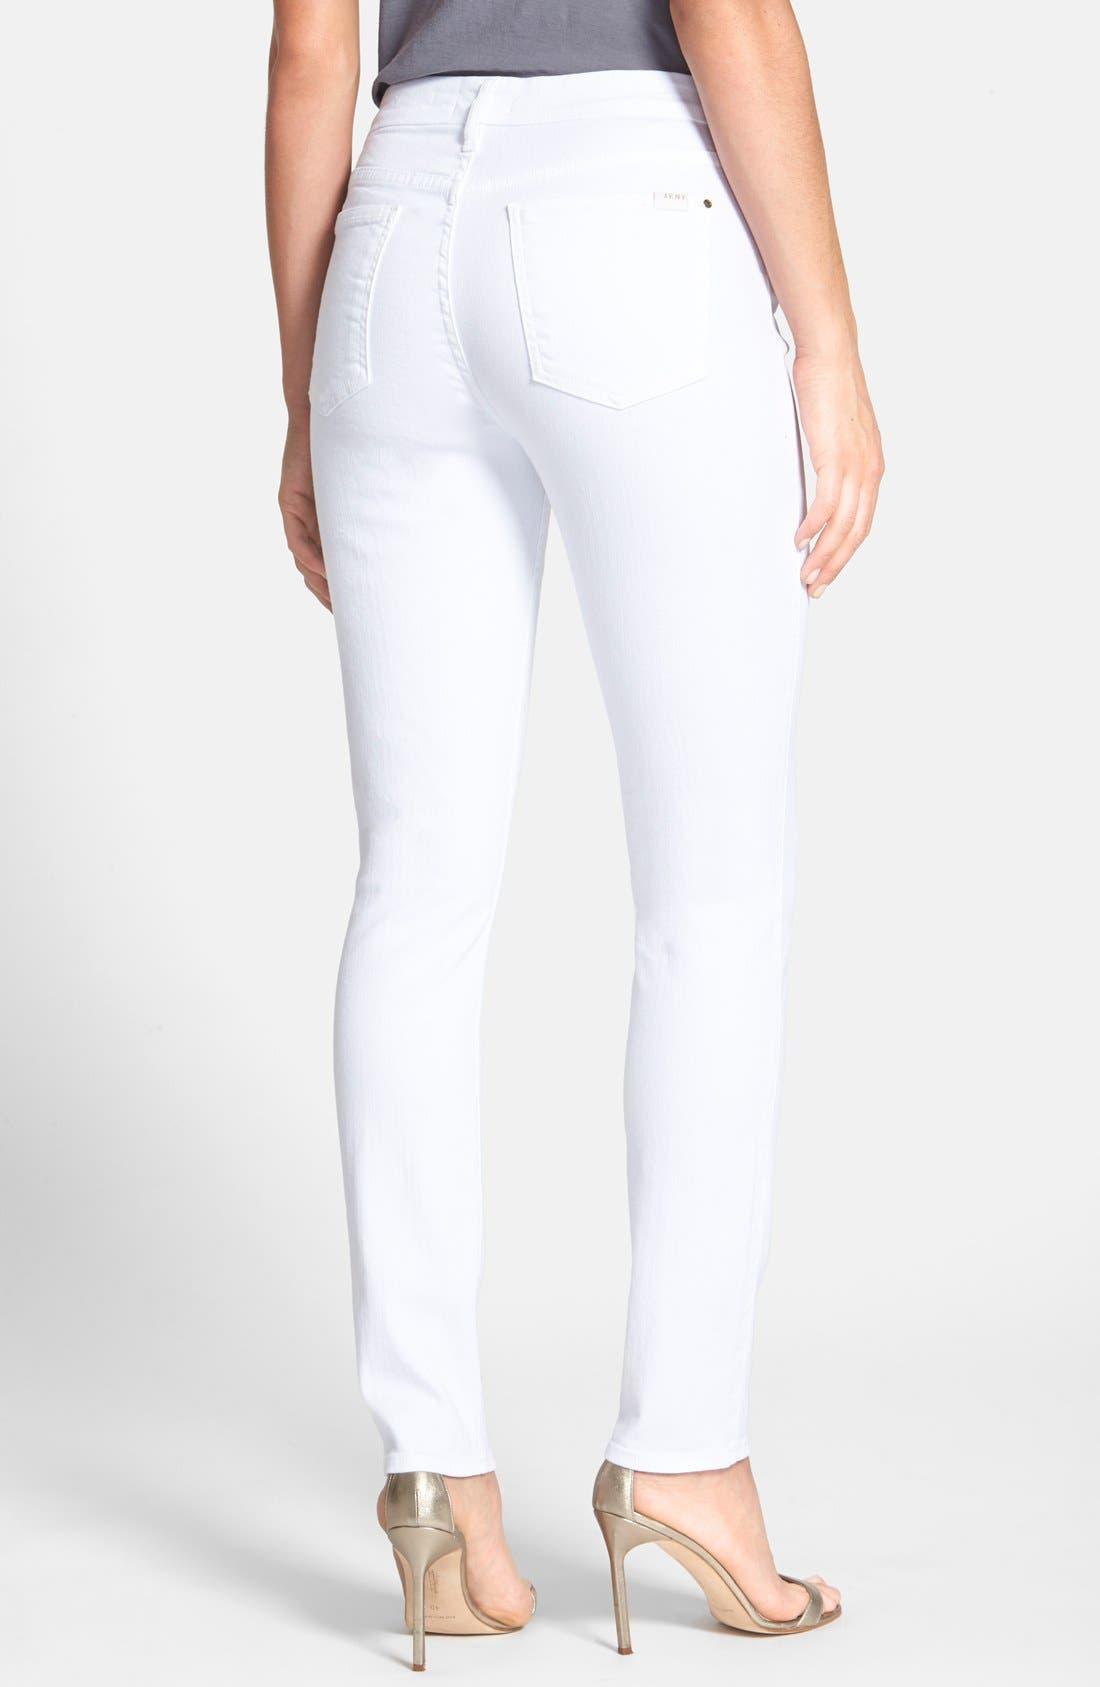 Stretch Skinny Jeans,                             Alternate thumbnail 2, color,                             White Denim